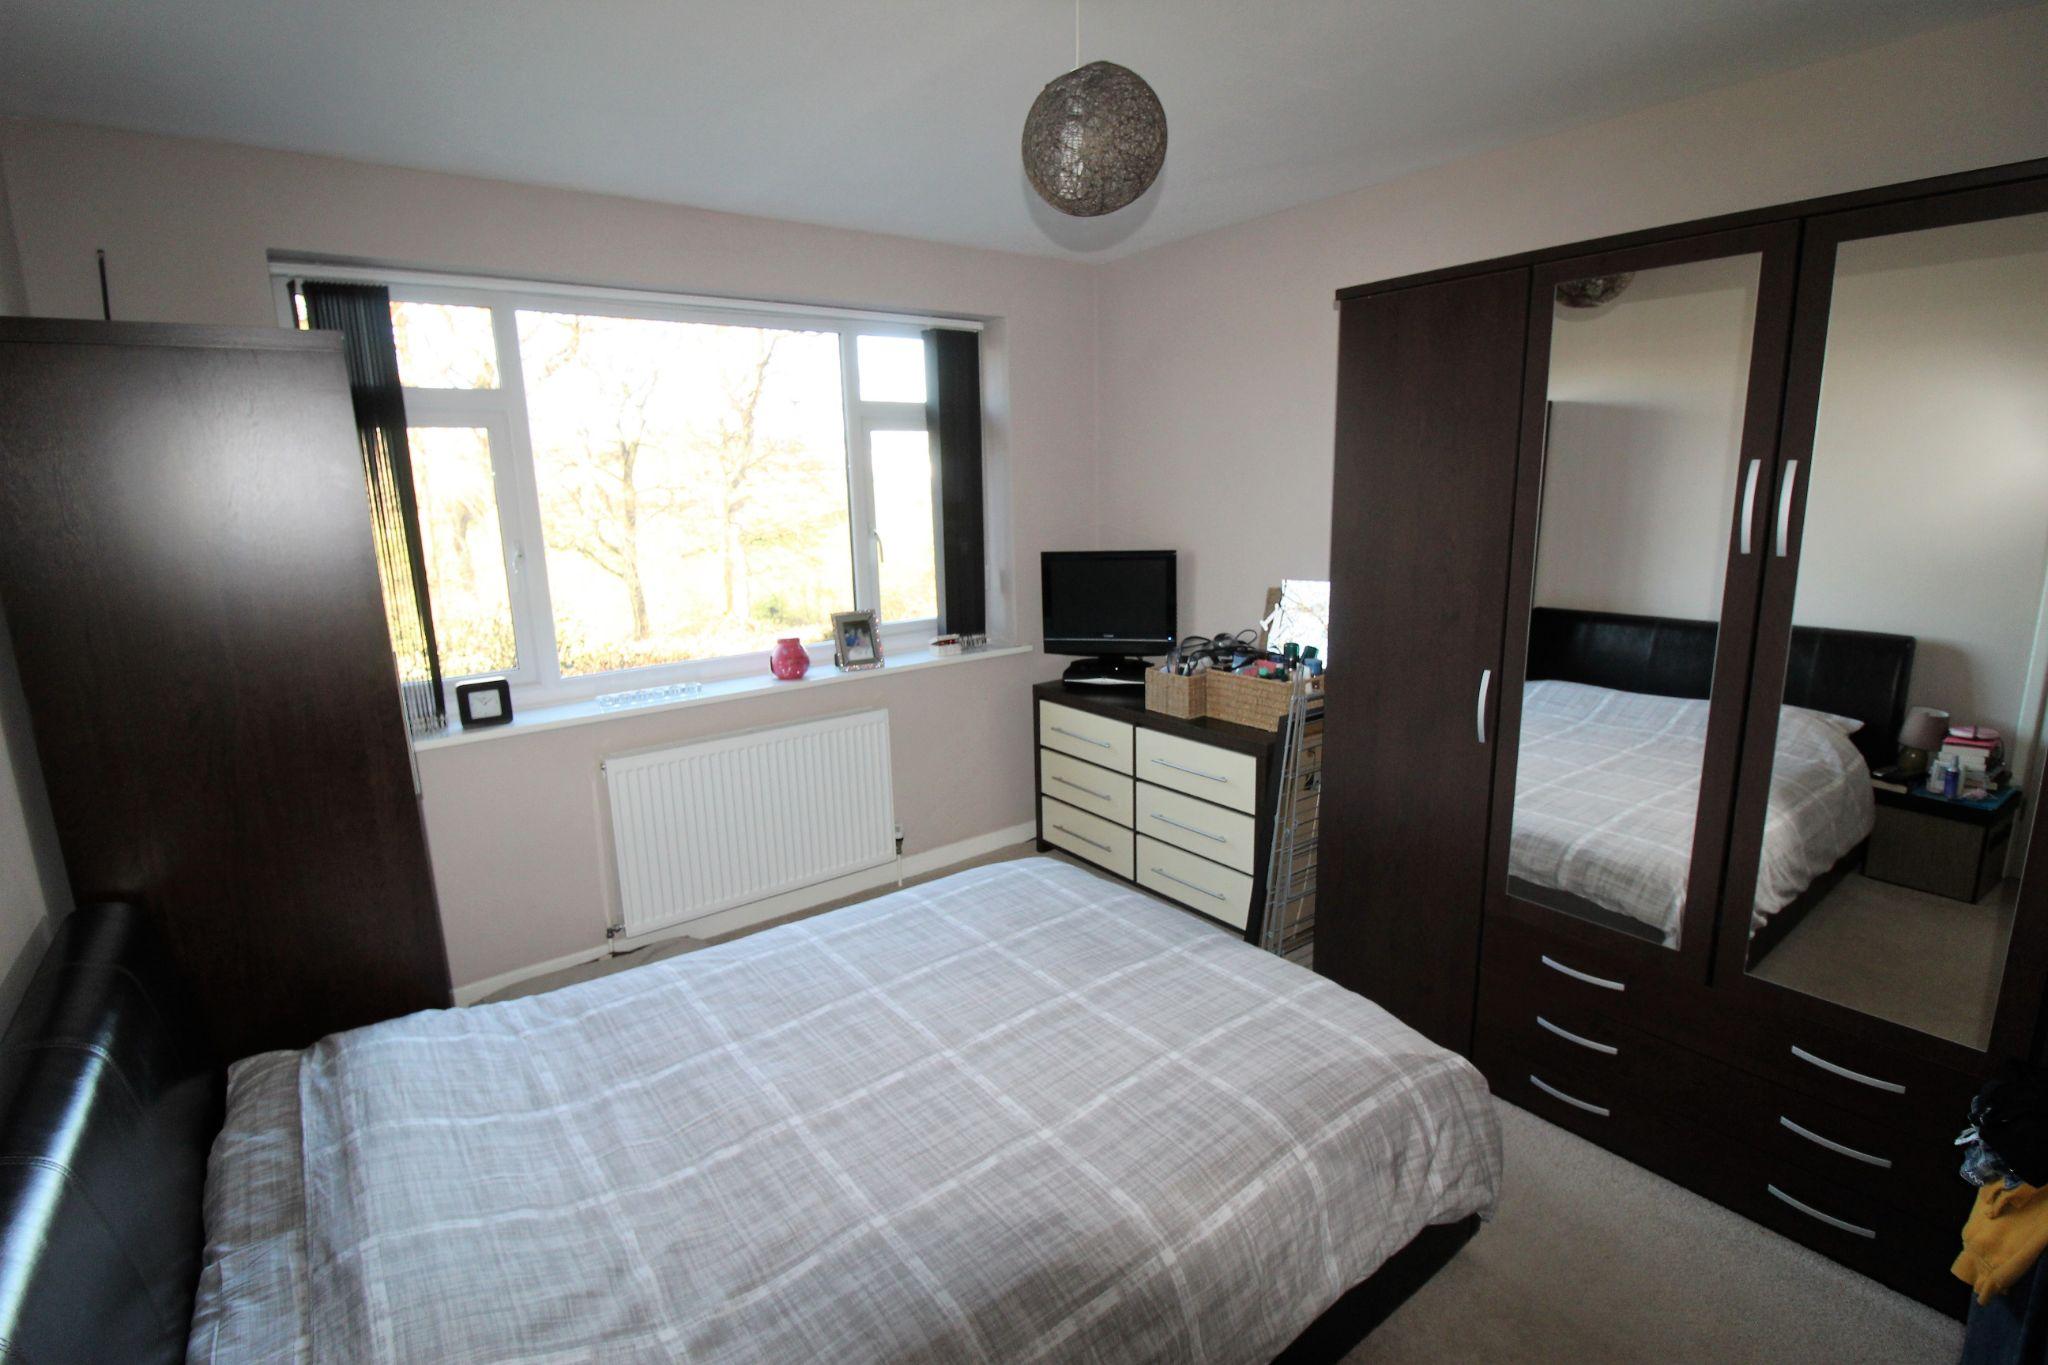 4 bedroom semi-detached bungalow SSTC in Brighouse - Bedroom 1